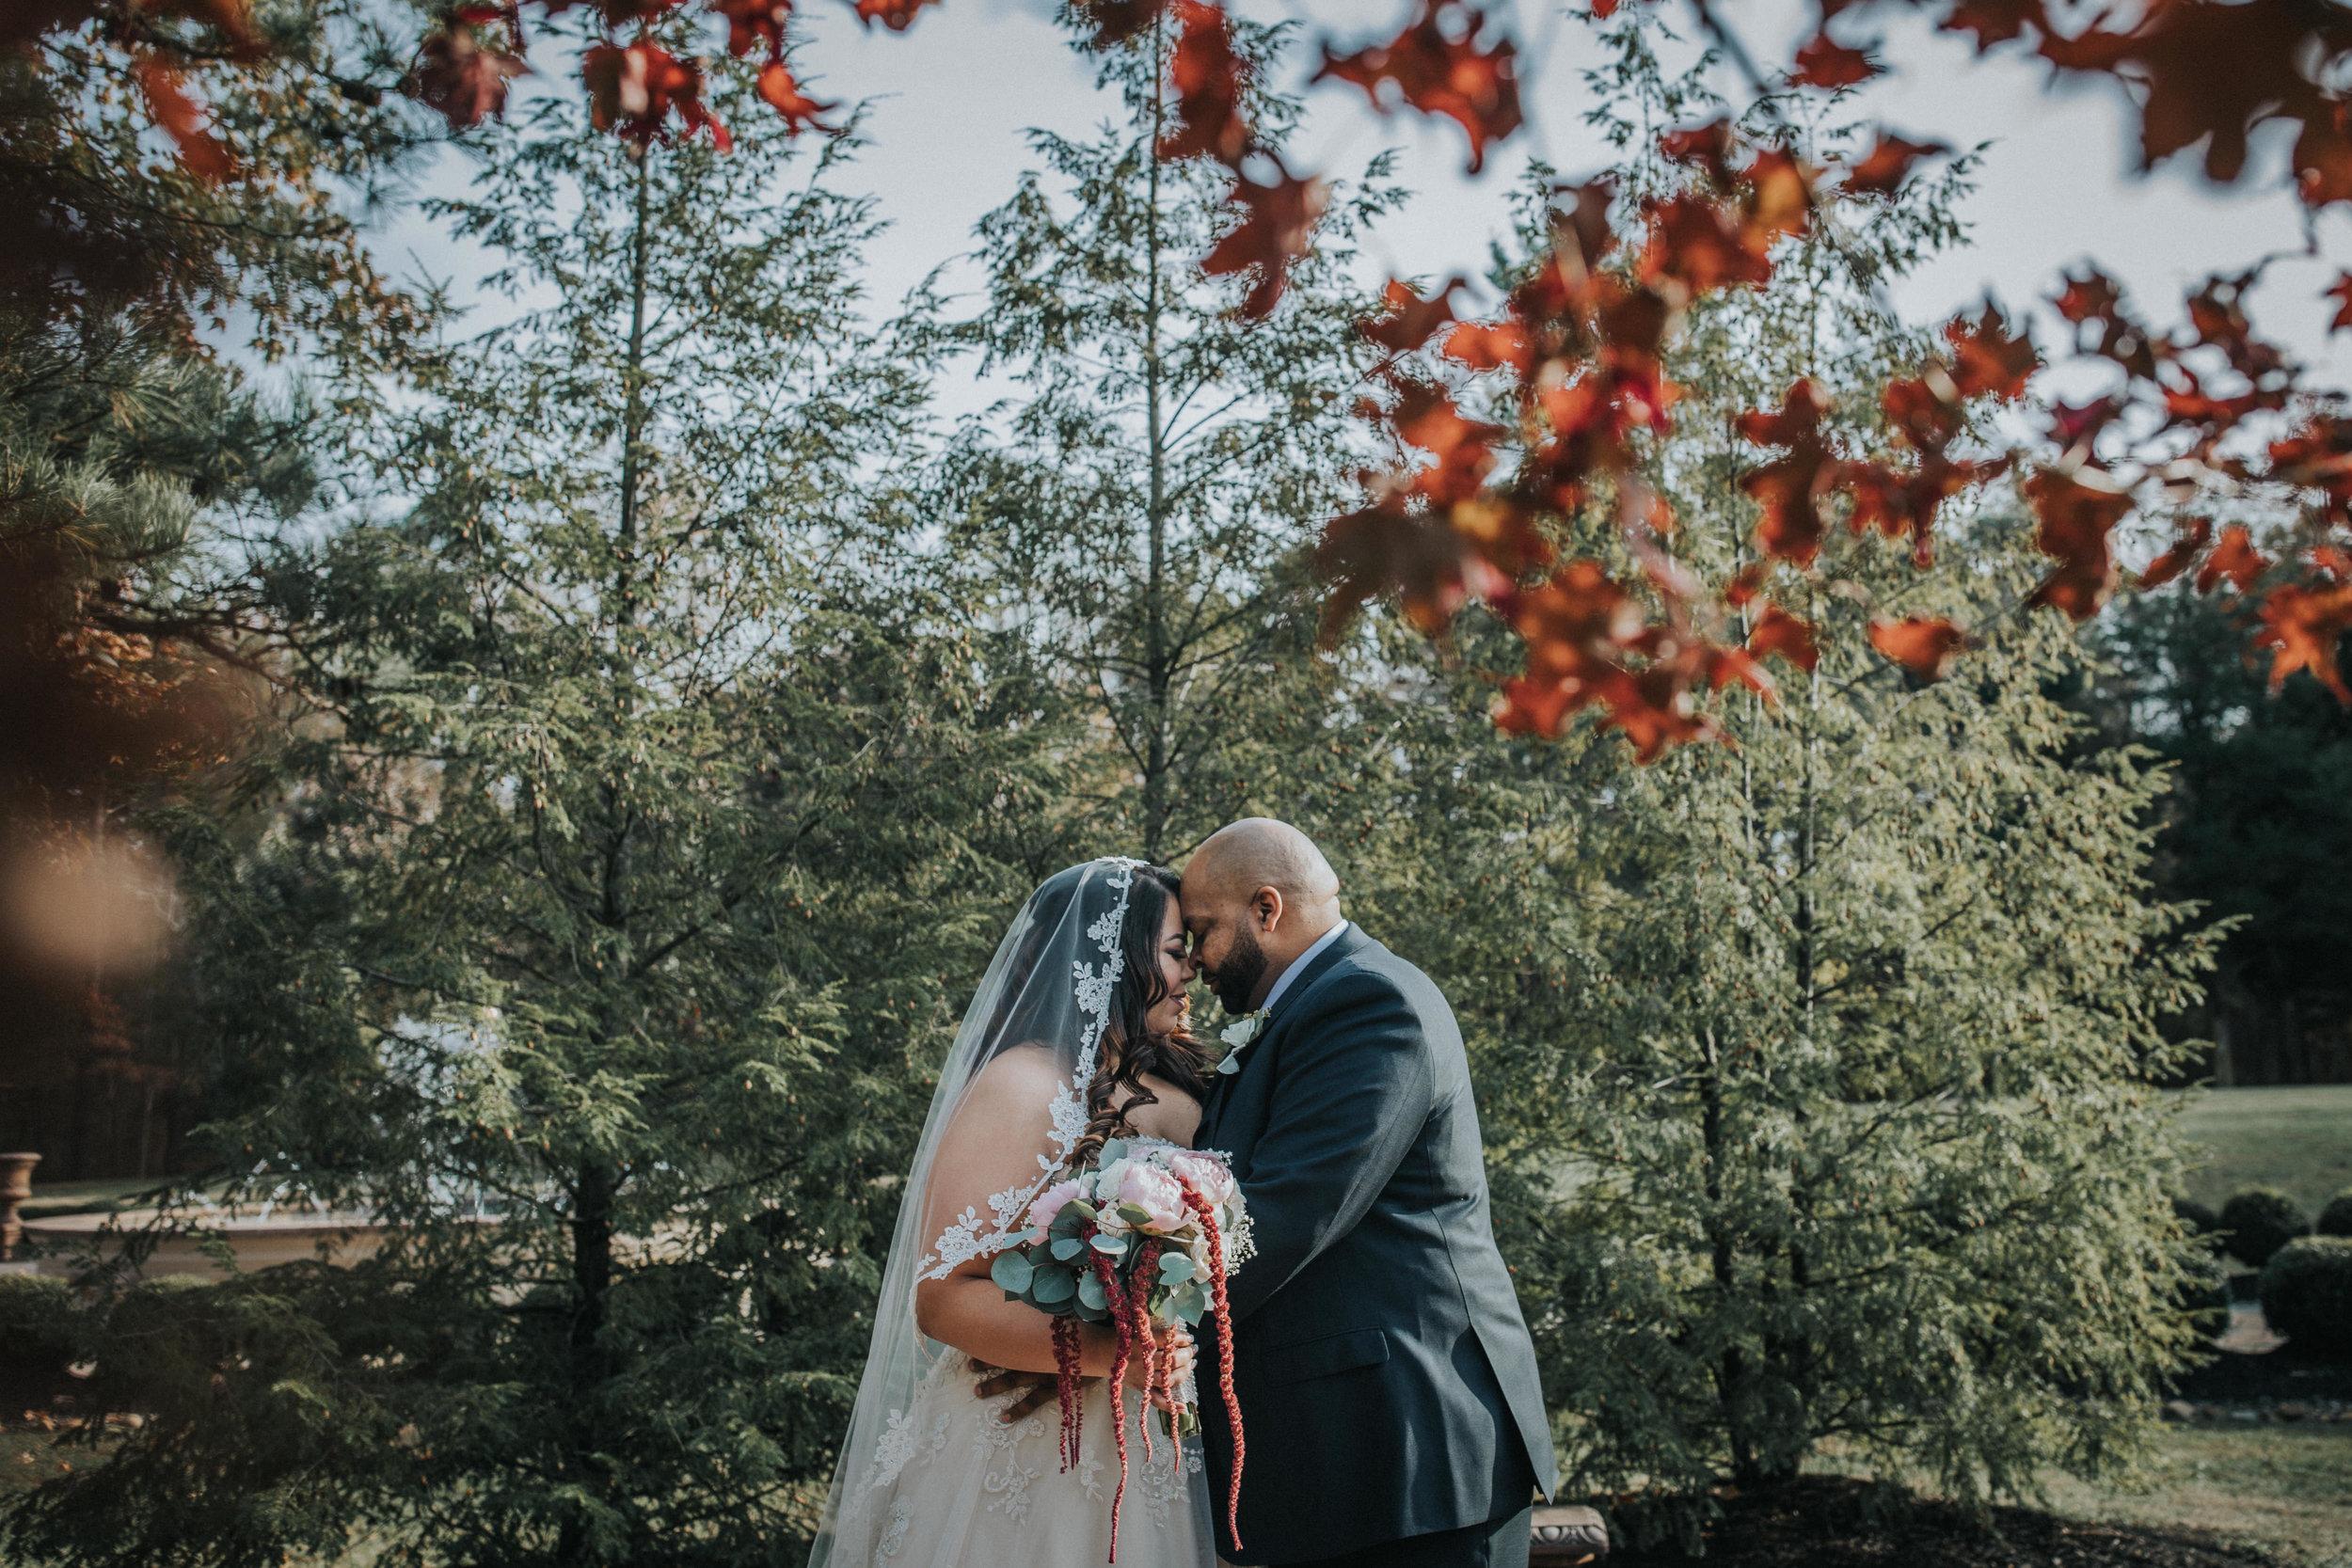 New-Jersey-Wedding-Photography-Brigalias-Deanna&Darryl-Bride&Groom-1.jpg